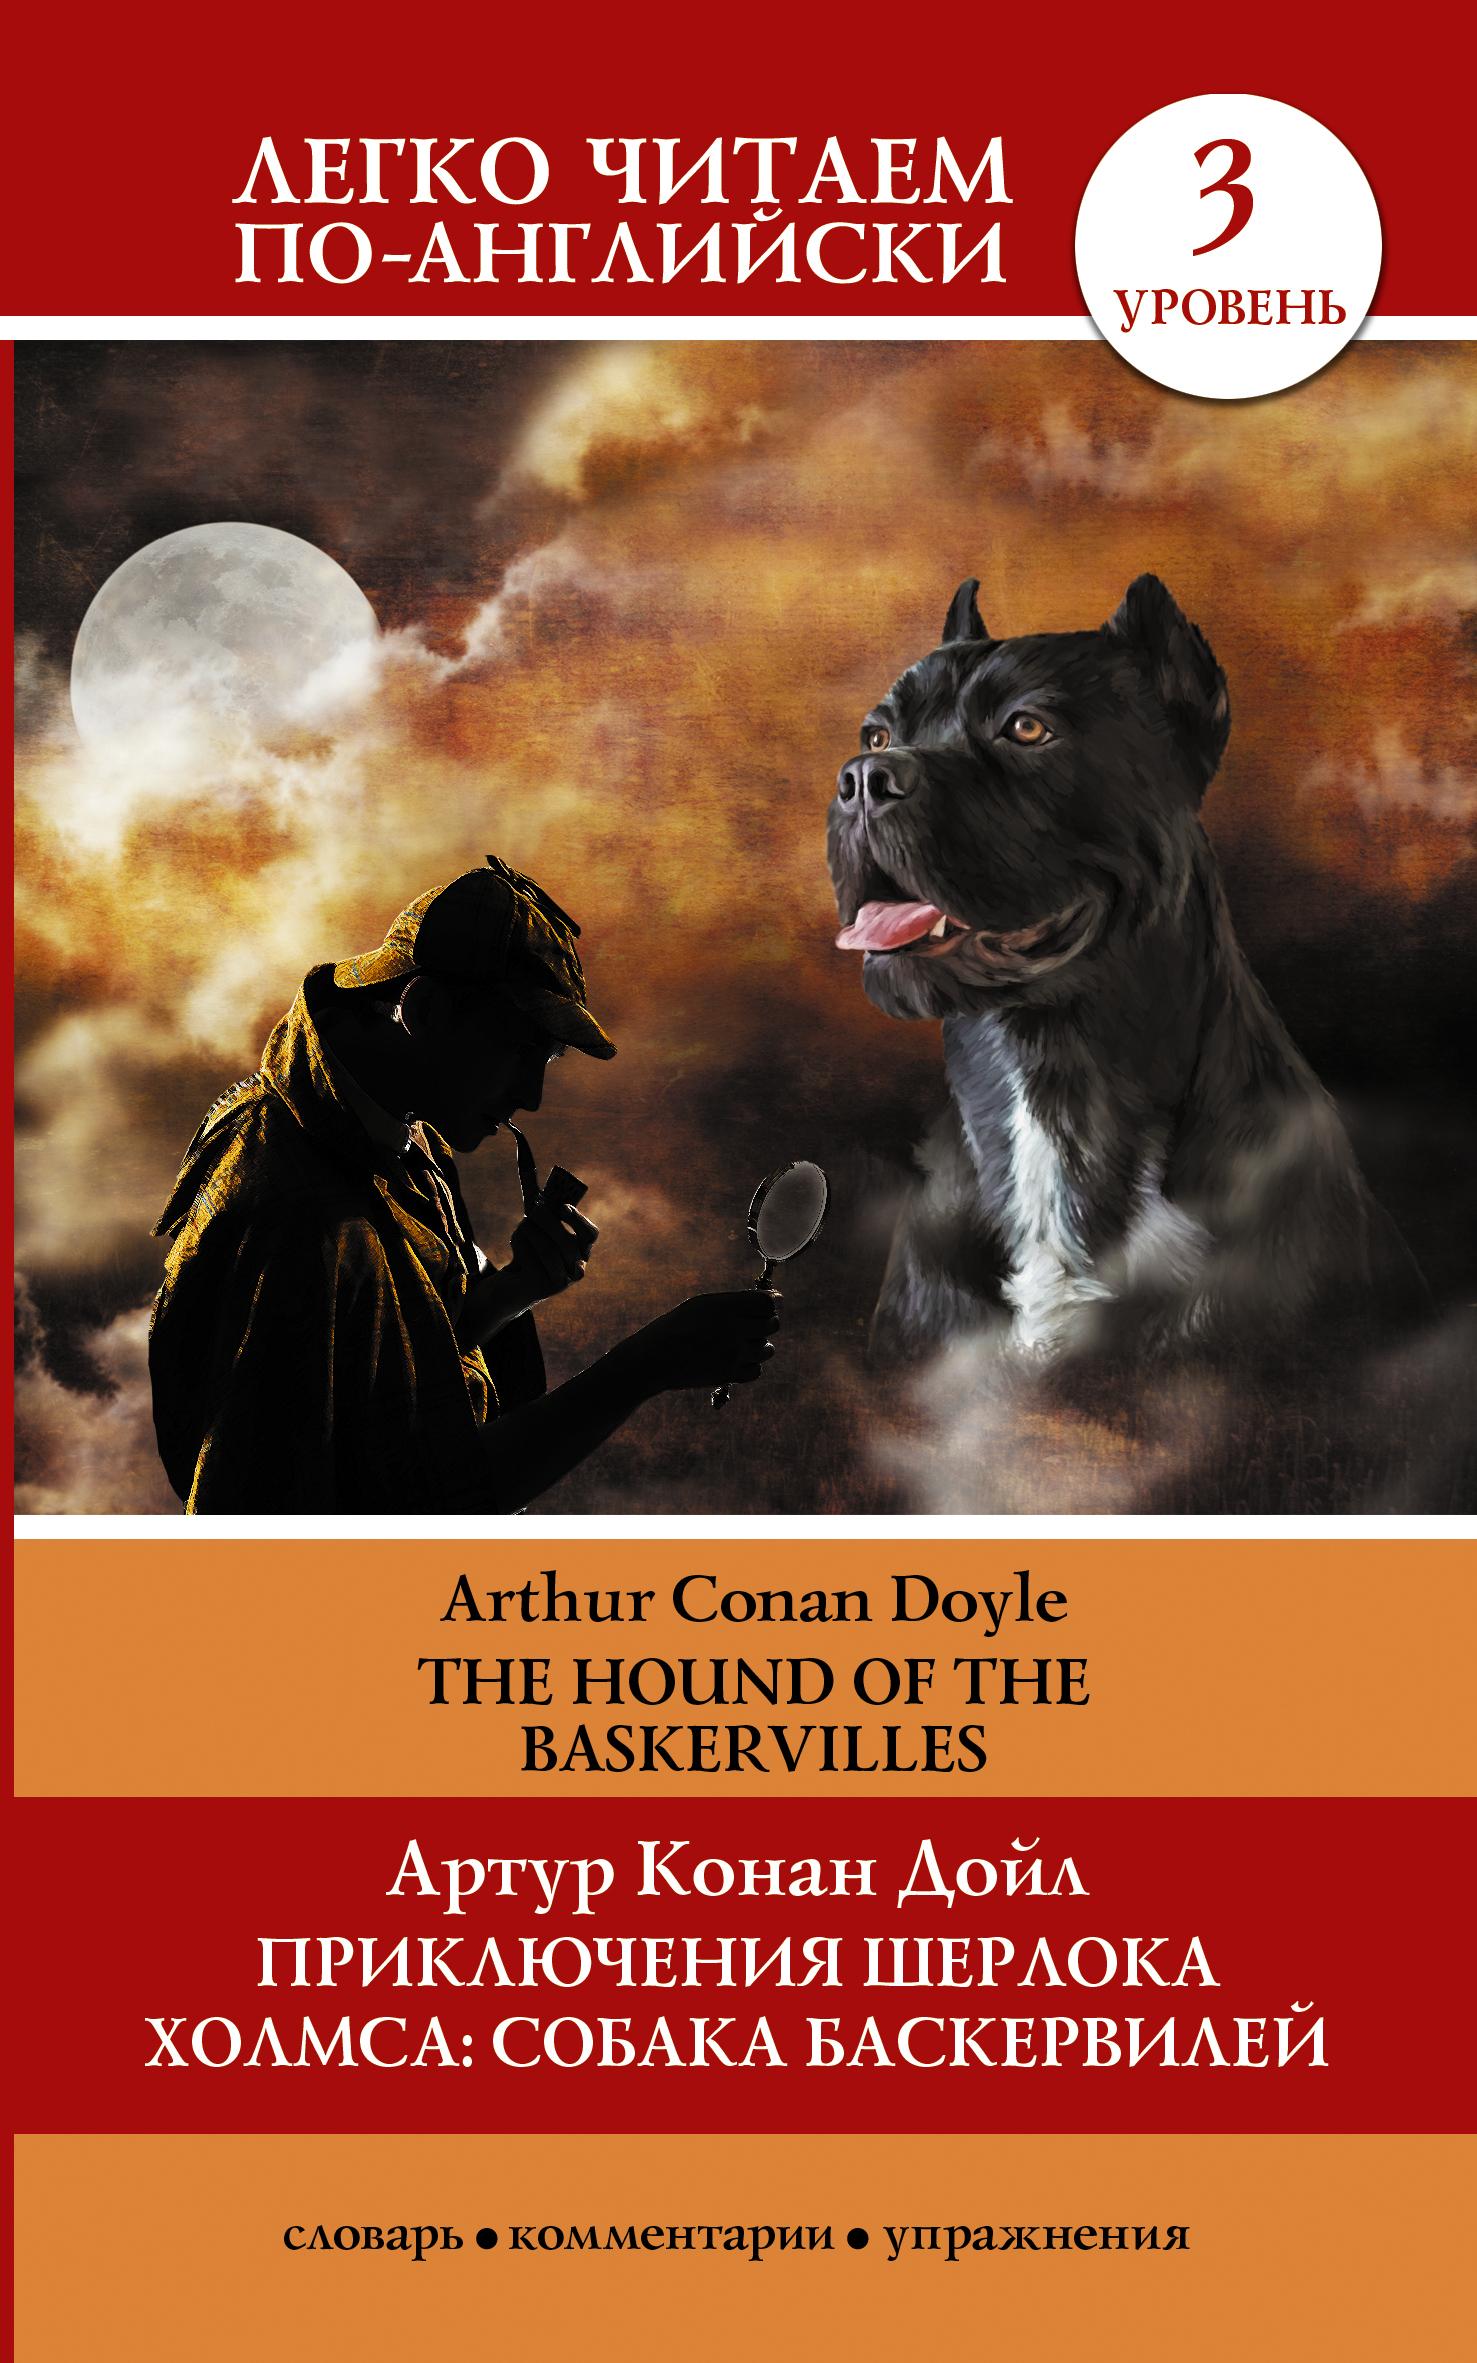 Дойл А.К. Приключения Шерлока Холмса. Собака Баскервилей=The Hound of the Baskervilles hound of hades 2